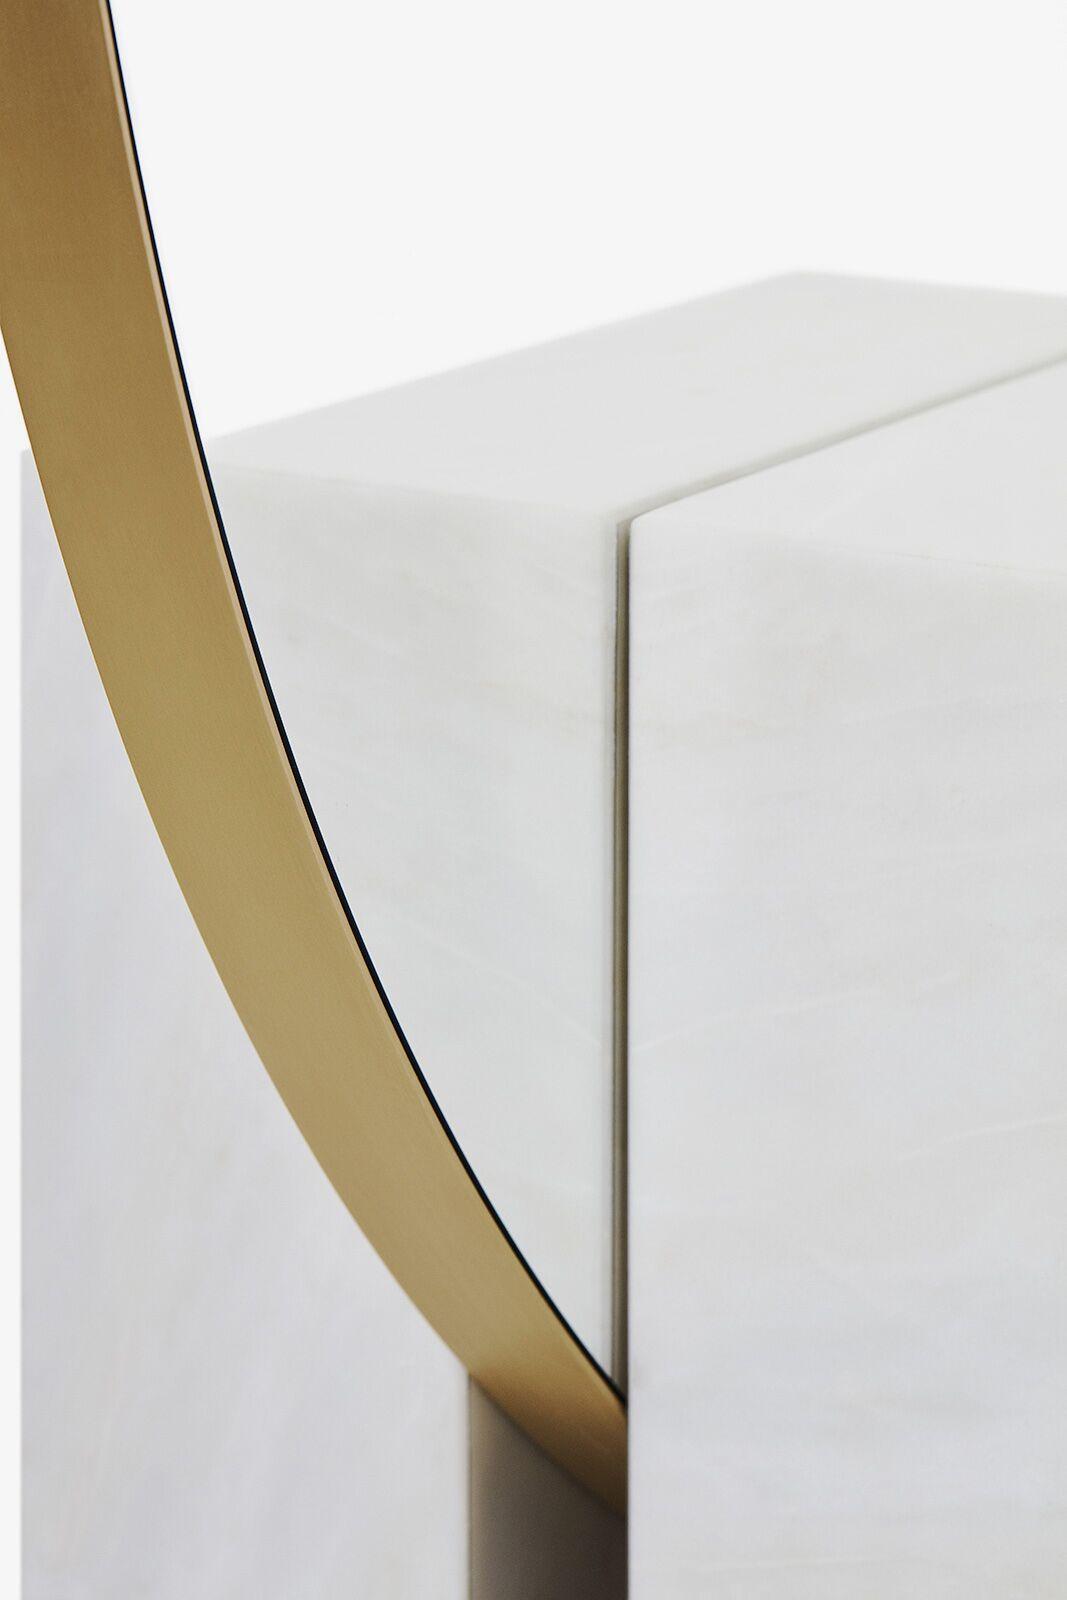 Miroir Kika Design By Joris Poggioli Youth Editions Ph By Maxime Tetard Les Graphiquants Miroir De Table Design Miroir